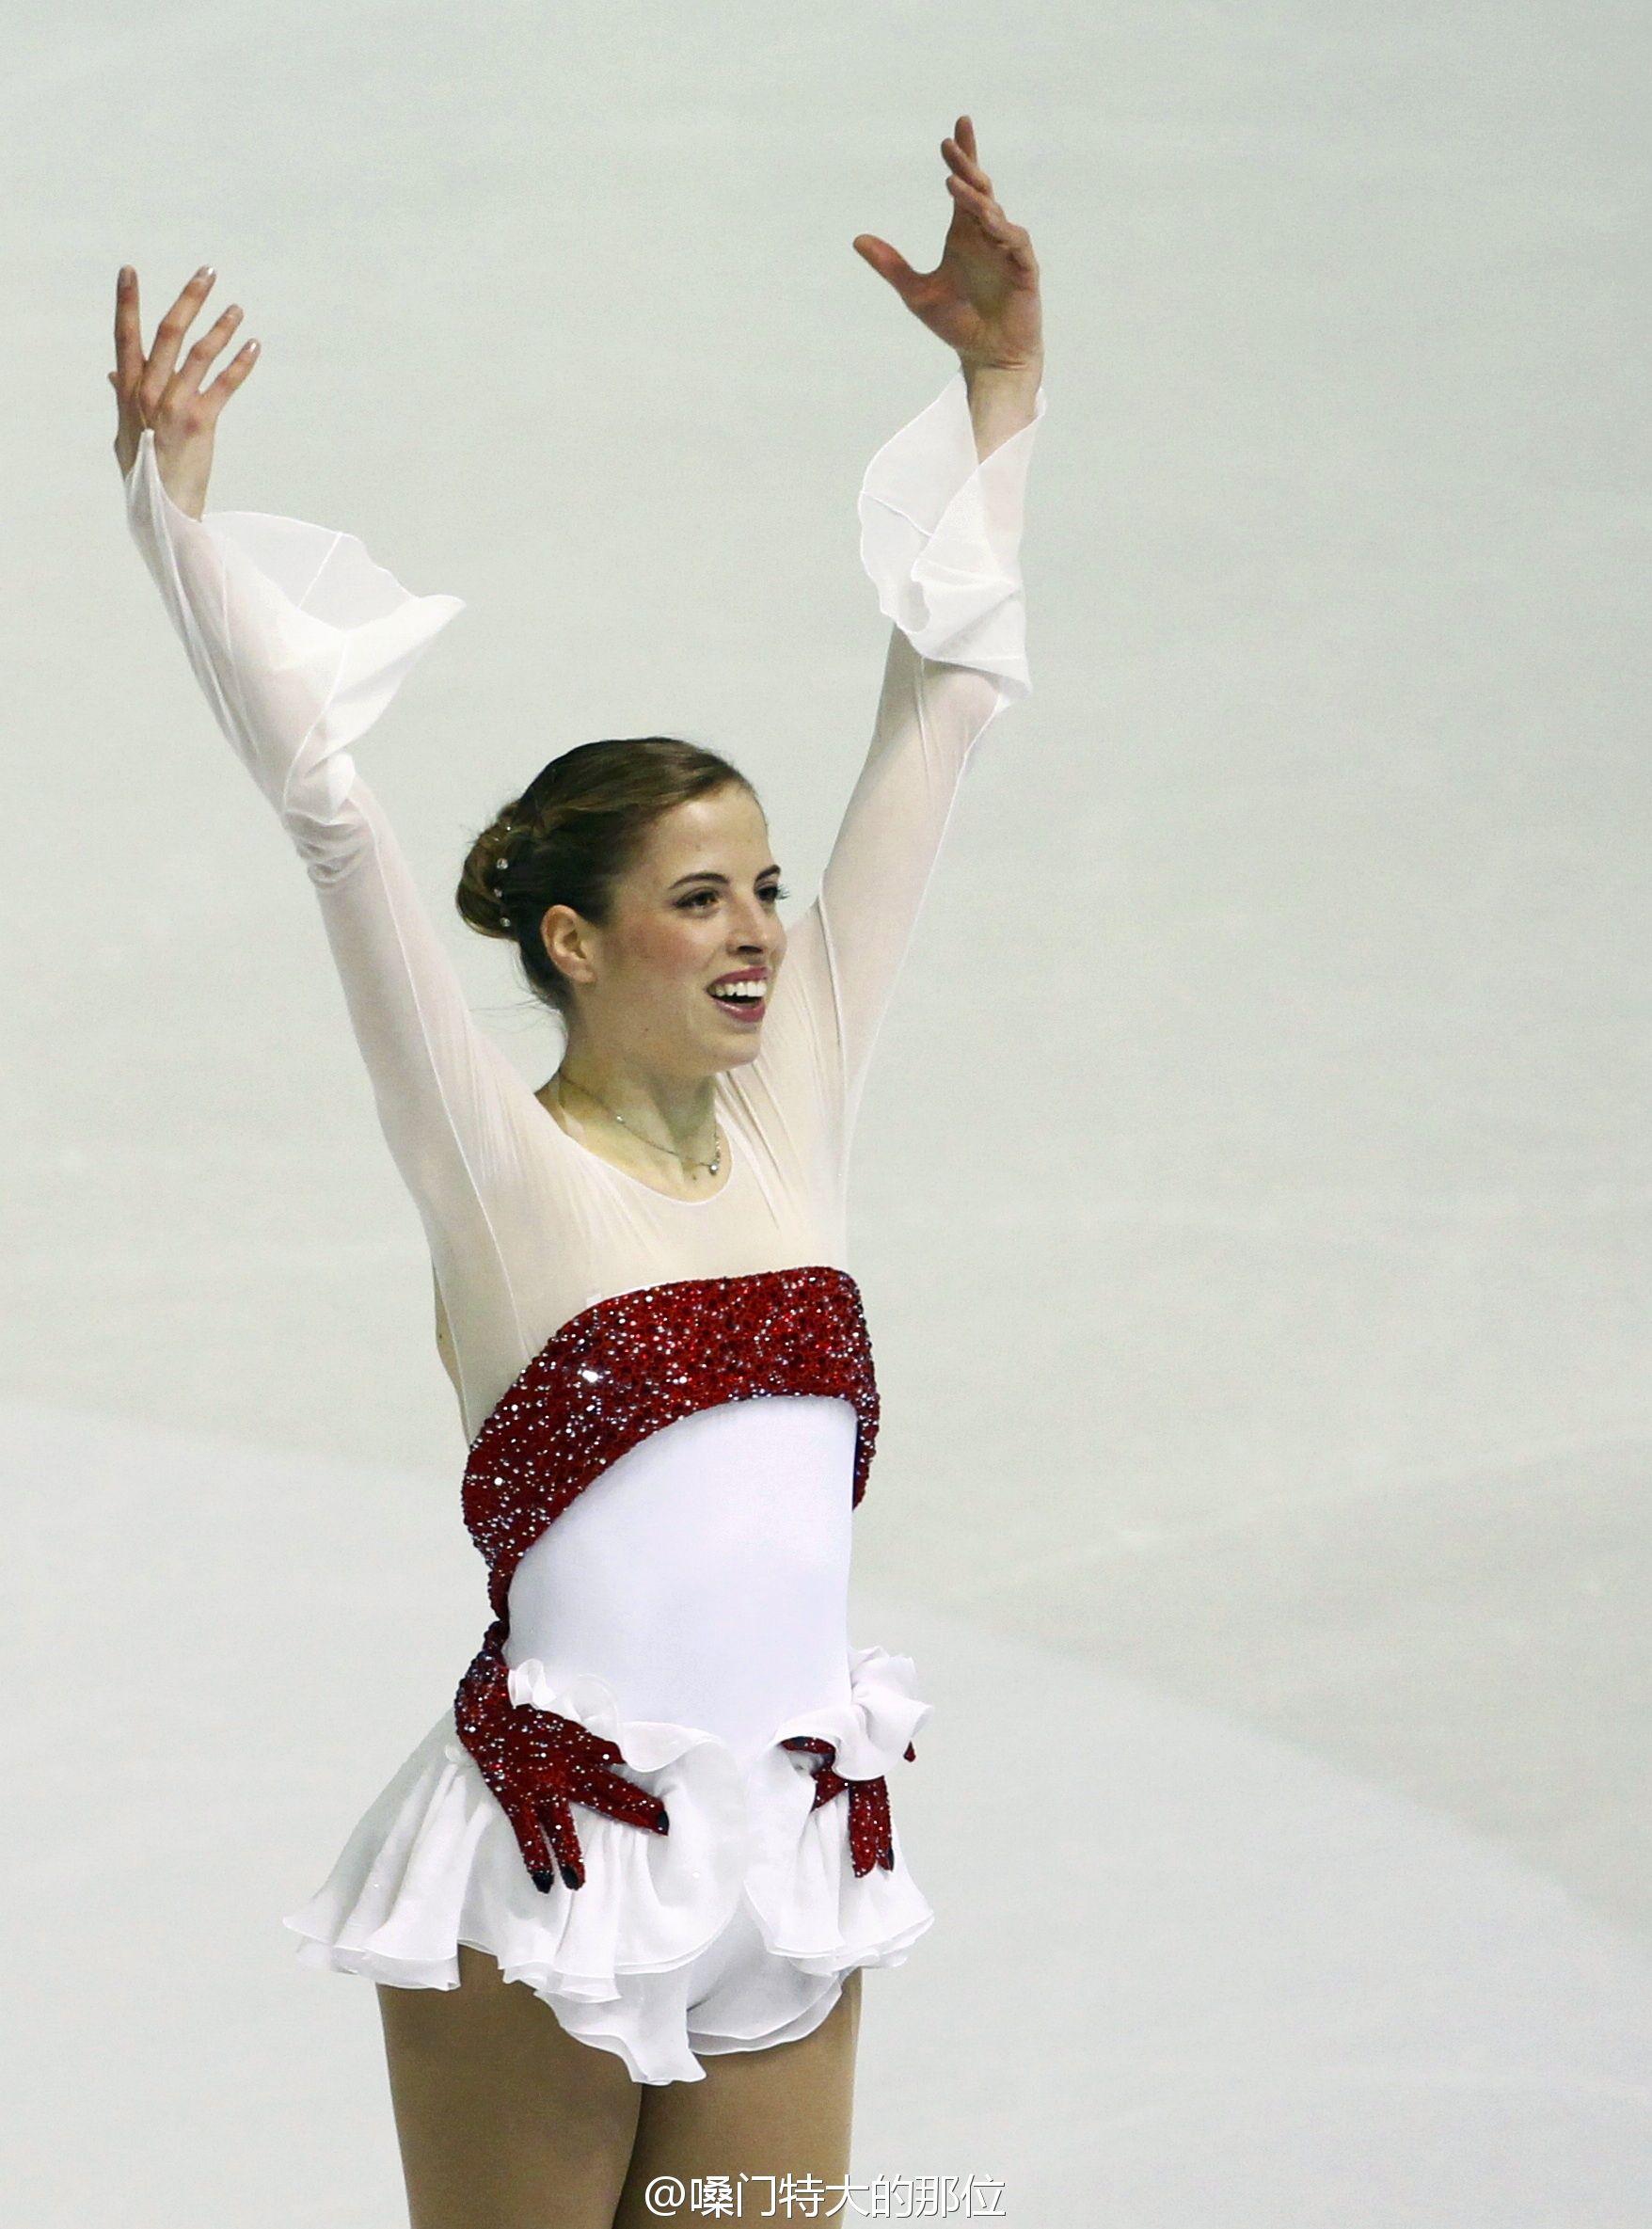 Carolina KostnerWhite Figure Skating / Ice Skating dress inspiration for Sk8 Gr8 Designs.